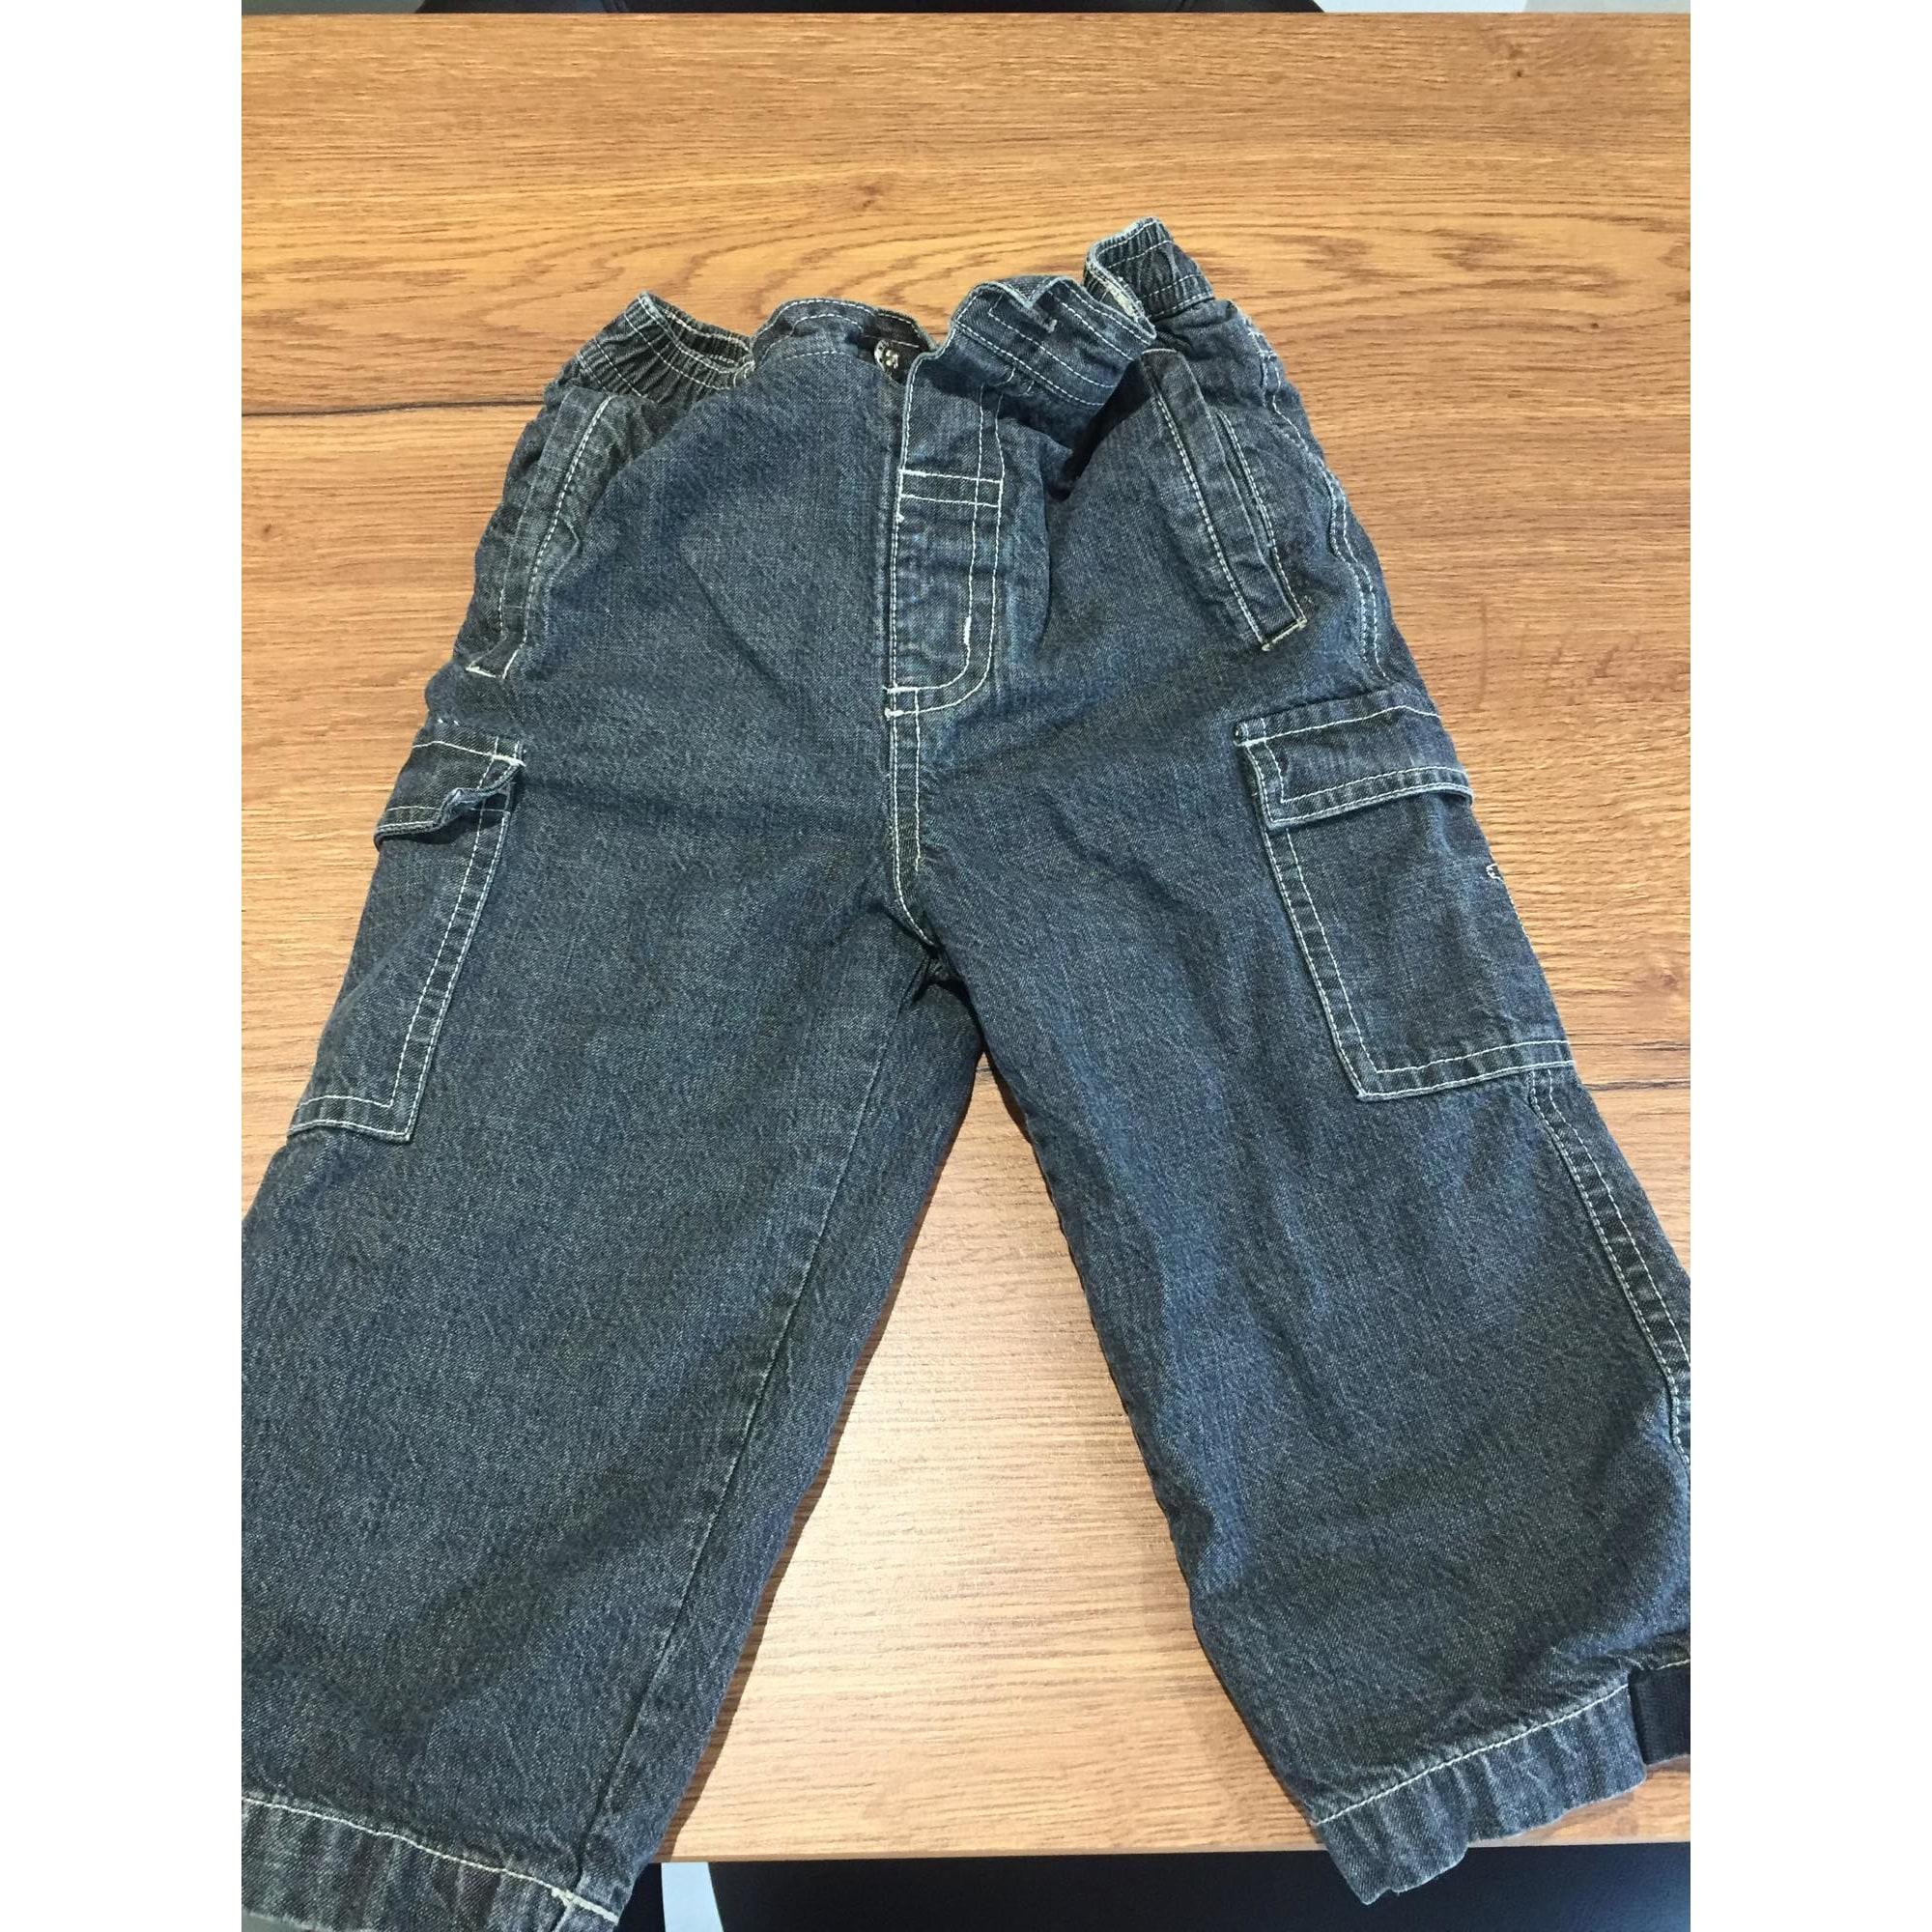 Pantalon NATALYS Gris, anthracite